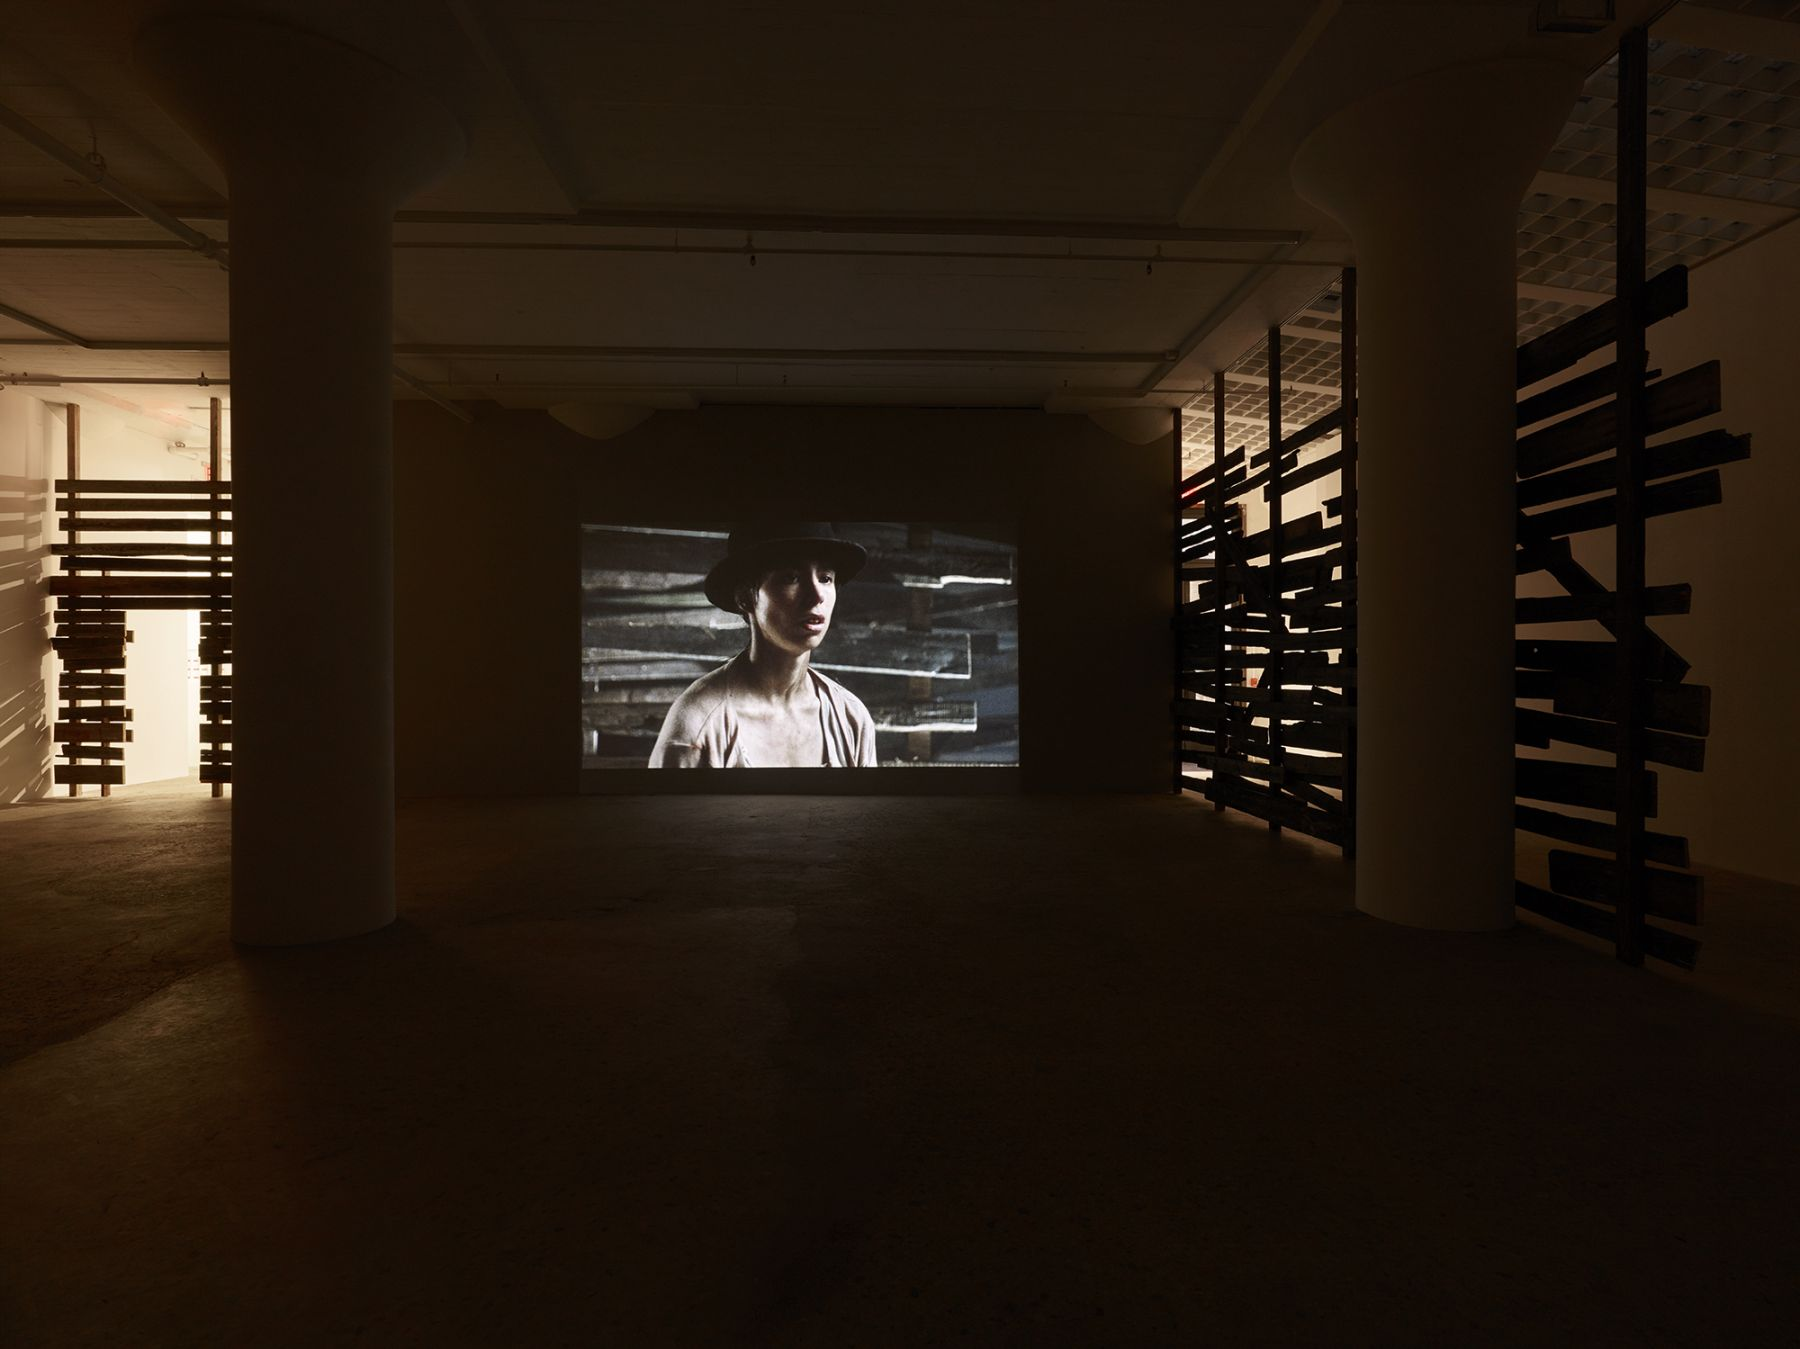 Installation view, Body Electric,Greene Naftali, New York, 2015